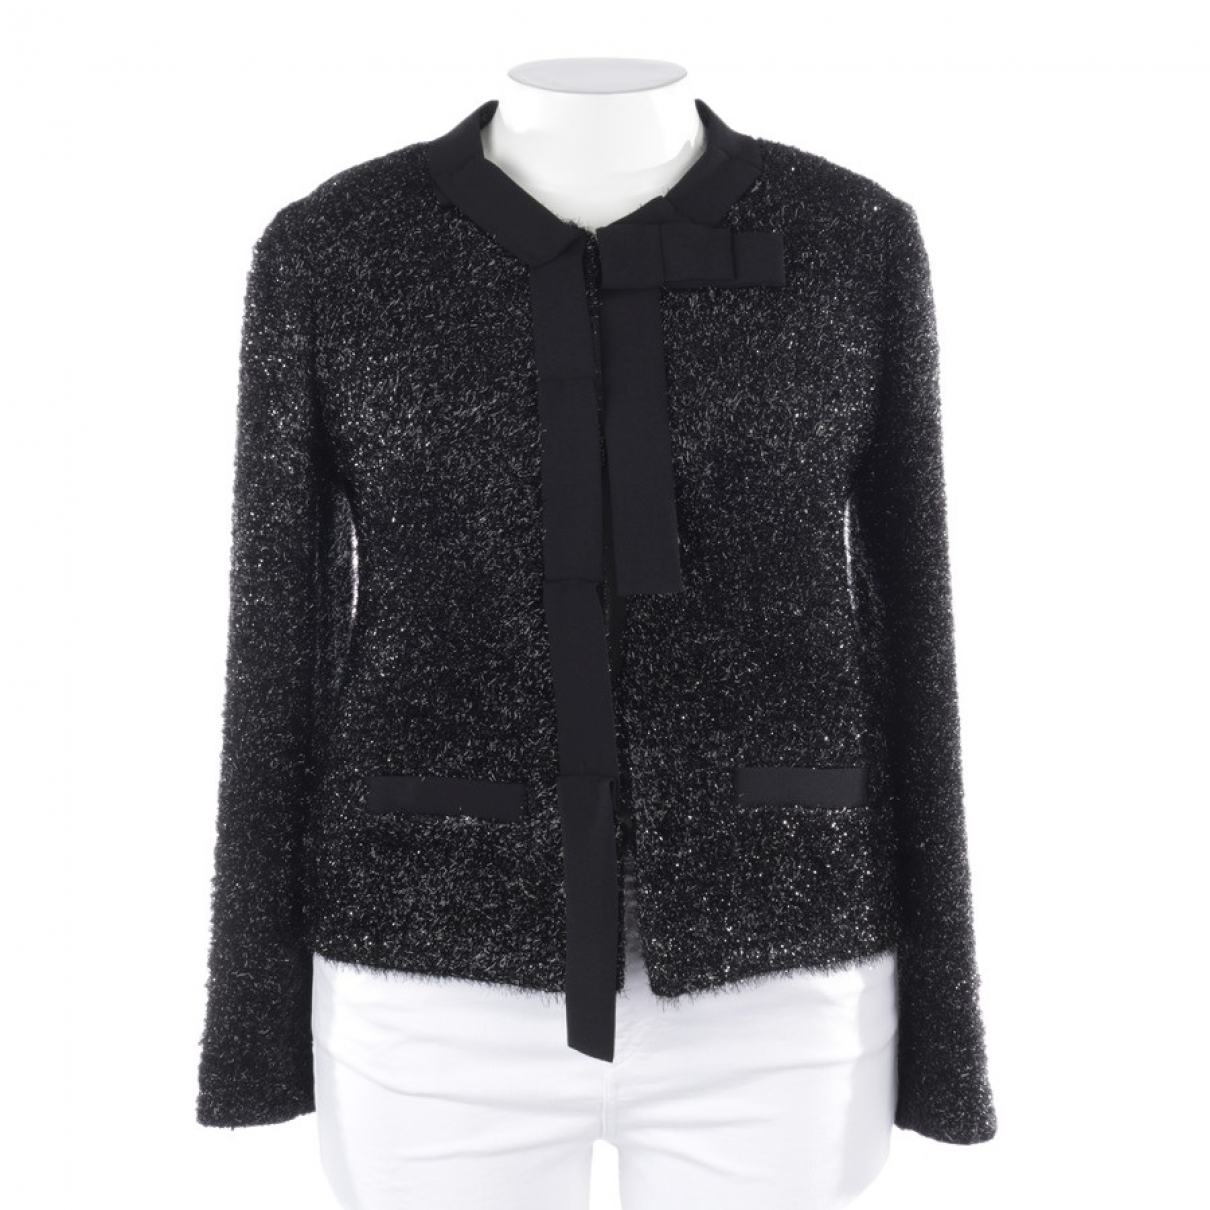 Shirtaporter \N Black jacket for Women 40 FR